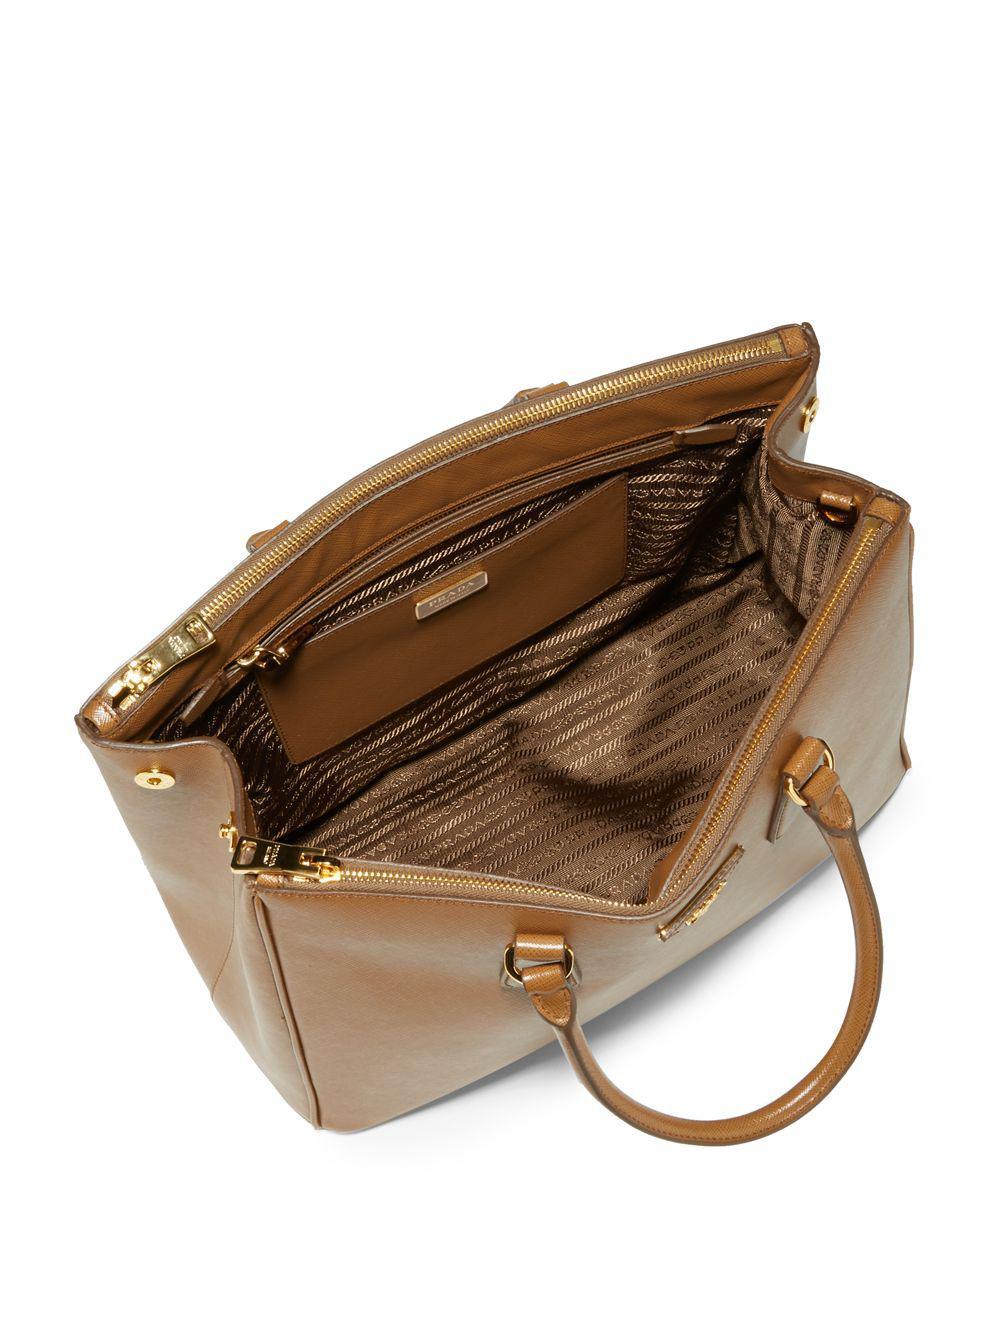 77de648f6b Lyst - Prada Saffiano Medium Leather Satchel in Brown